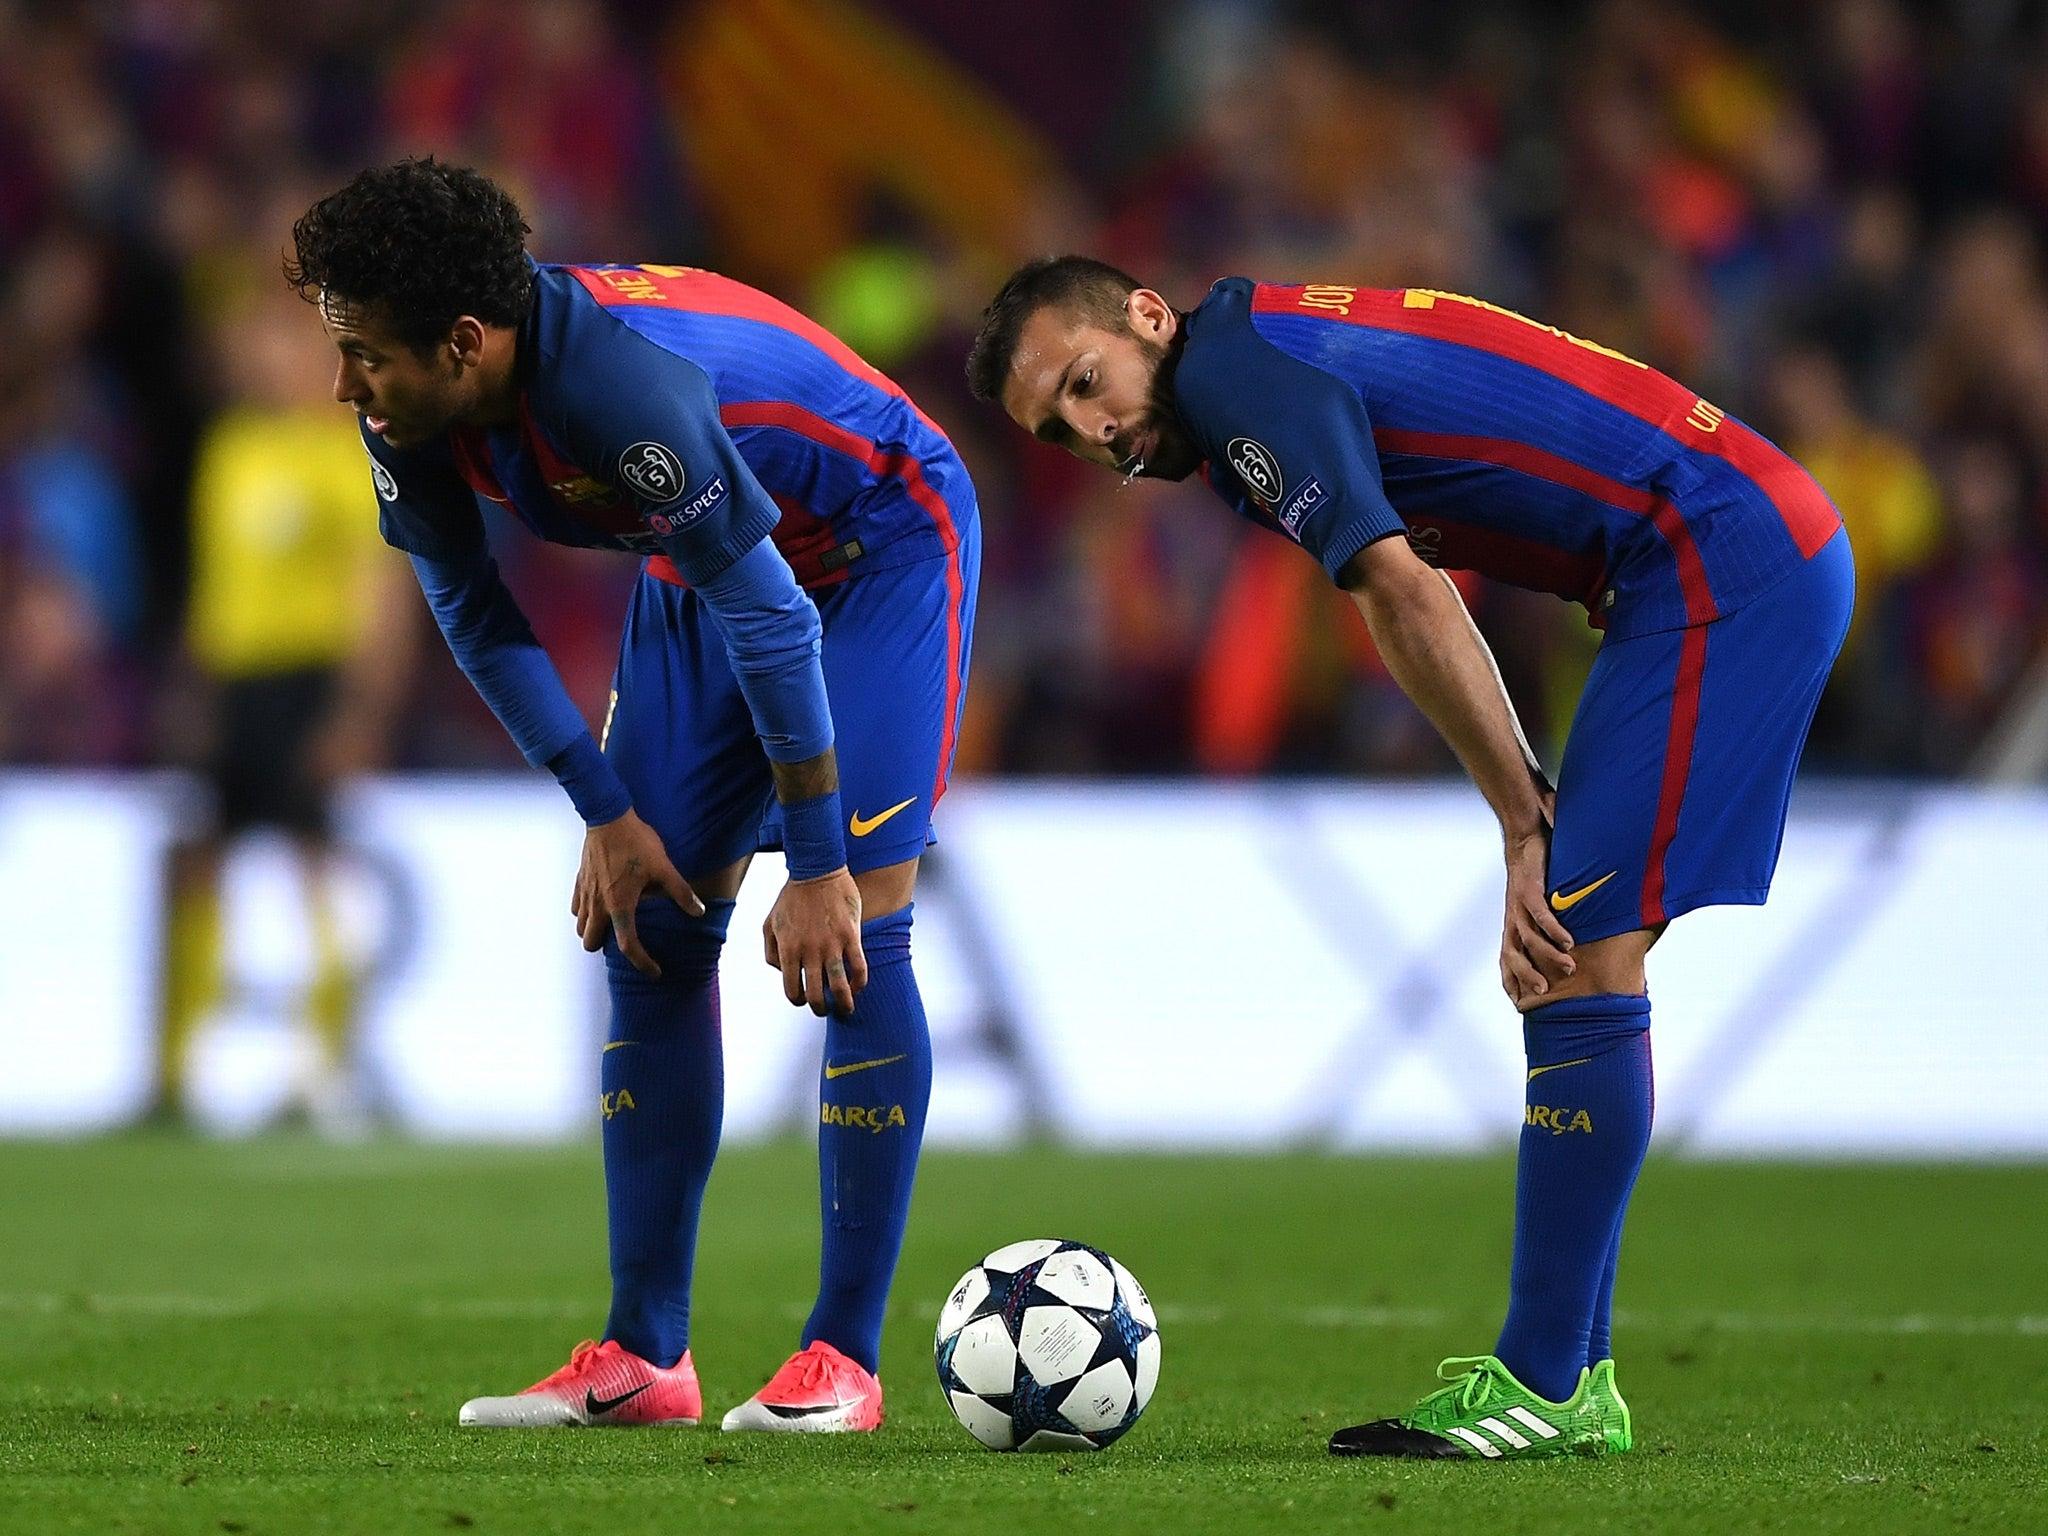 Player ratings: Barcelona vs JuventusCamp Nou - FC Barcelona - Italy - Juventus FC - Lionel Messi - Nielsen Ratings - Paris Saint Germain FC - Paulo Dybala - Turin - UEFA Champions League